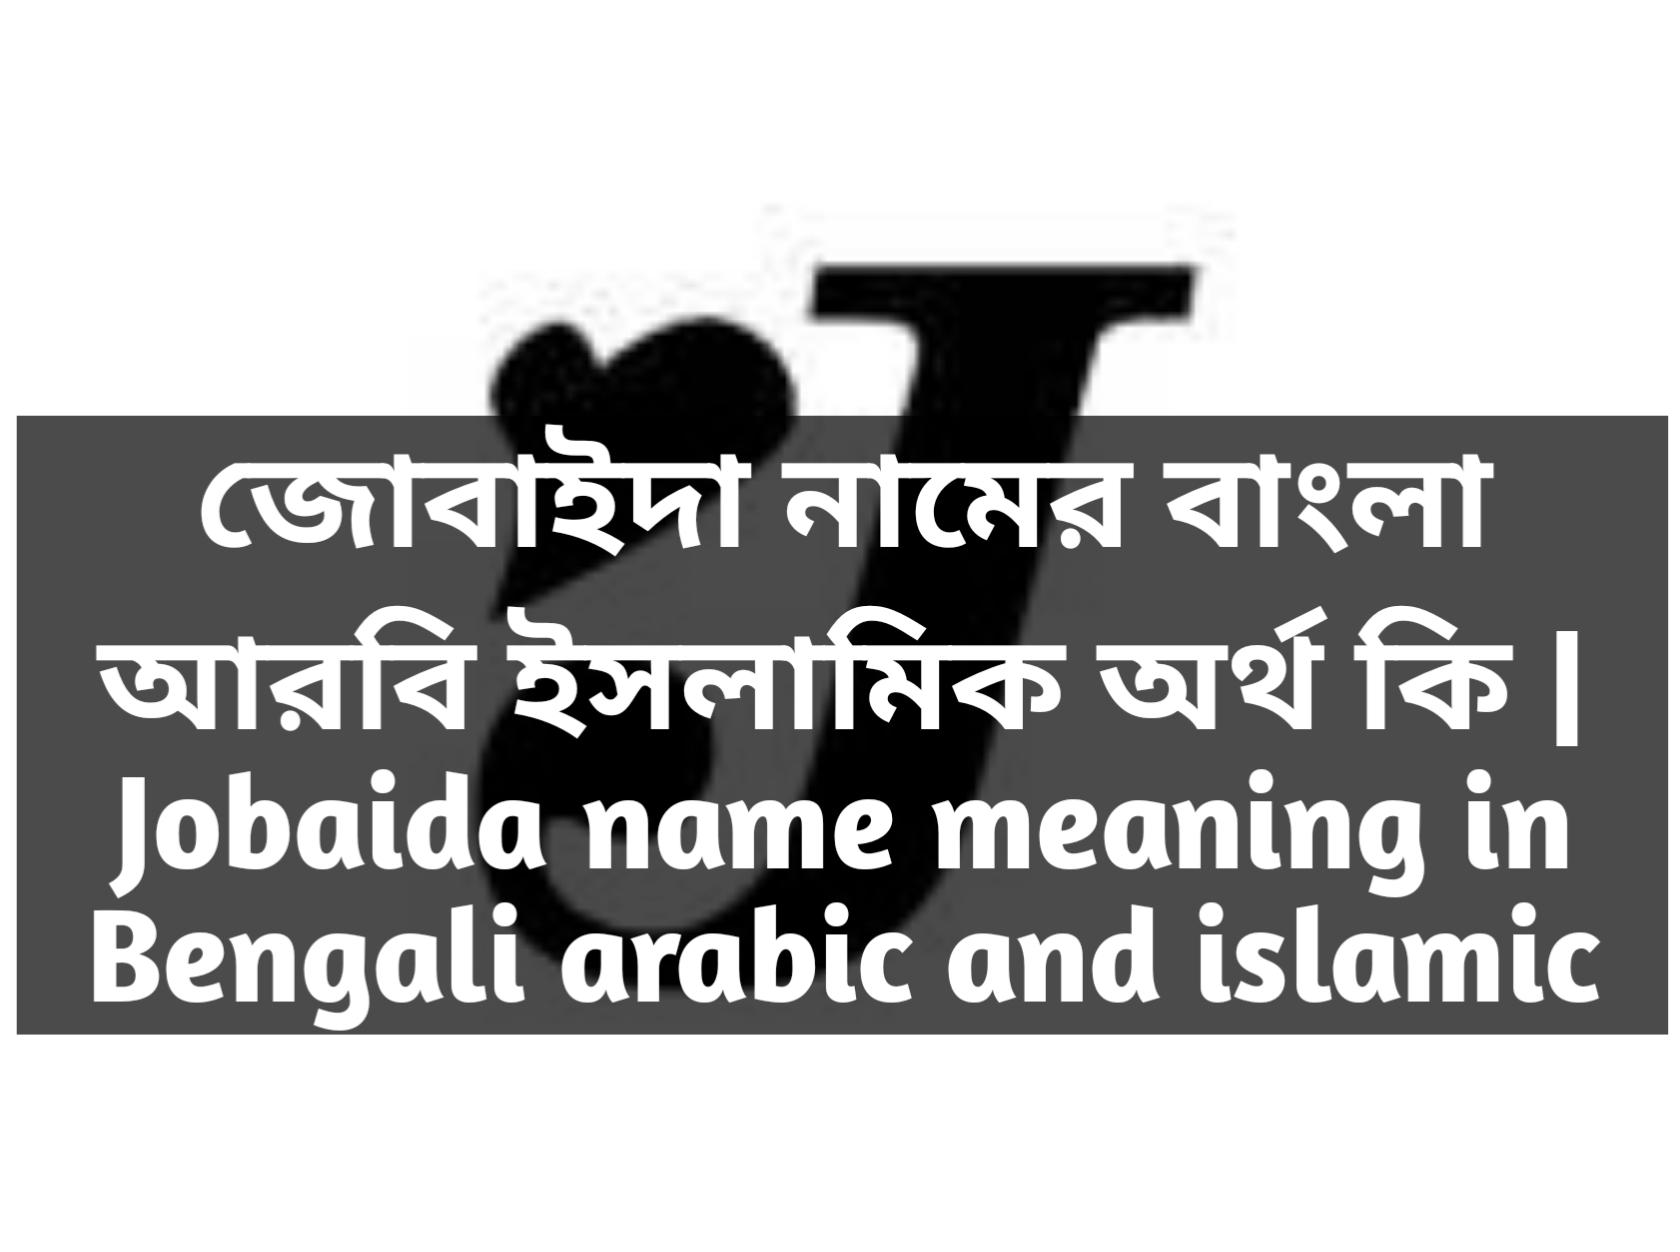 Jobaida name meaning in Bengali, জোবাইদা নামের অর্থ কি, জোবাইদা নামের বাংলা অর্থ কি, জোবাইদা নামের ইসলামিক অর্থ কি,